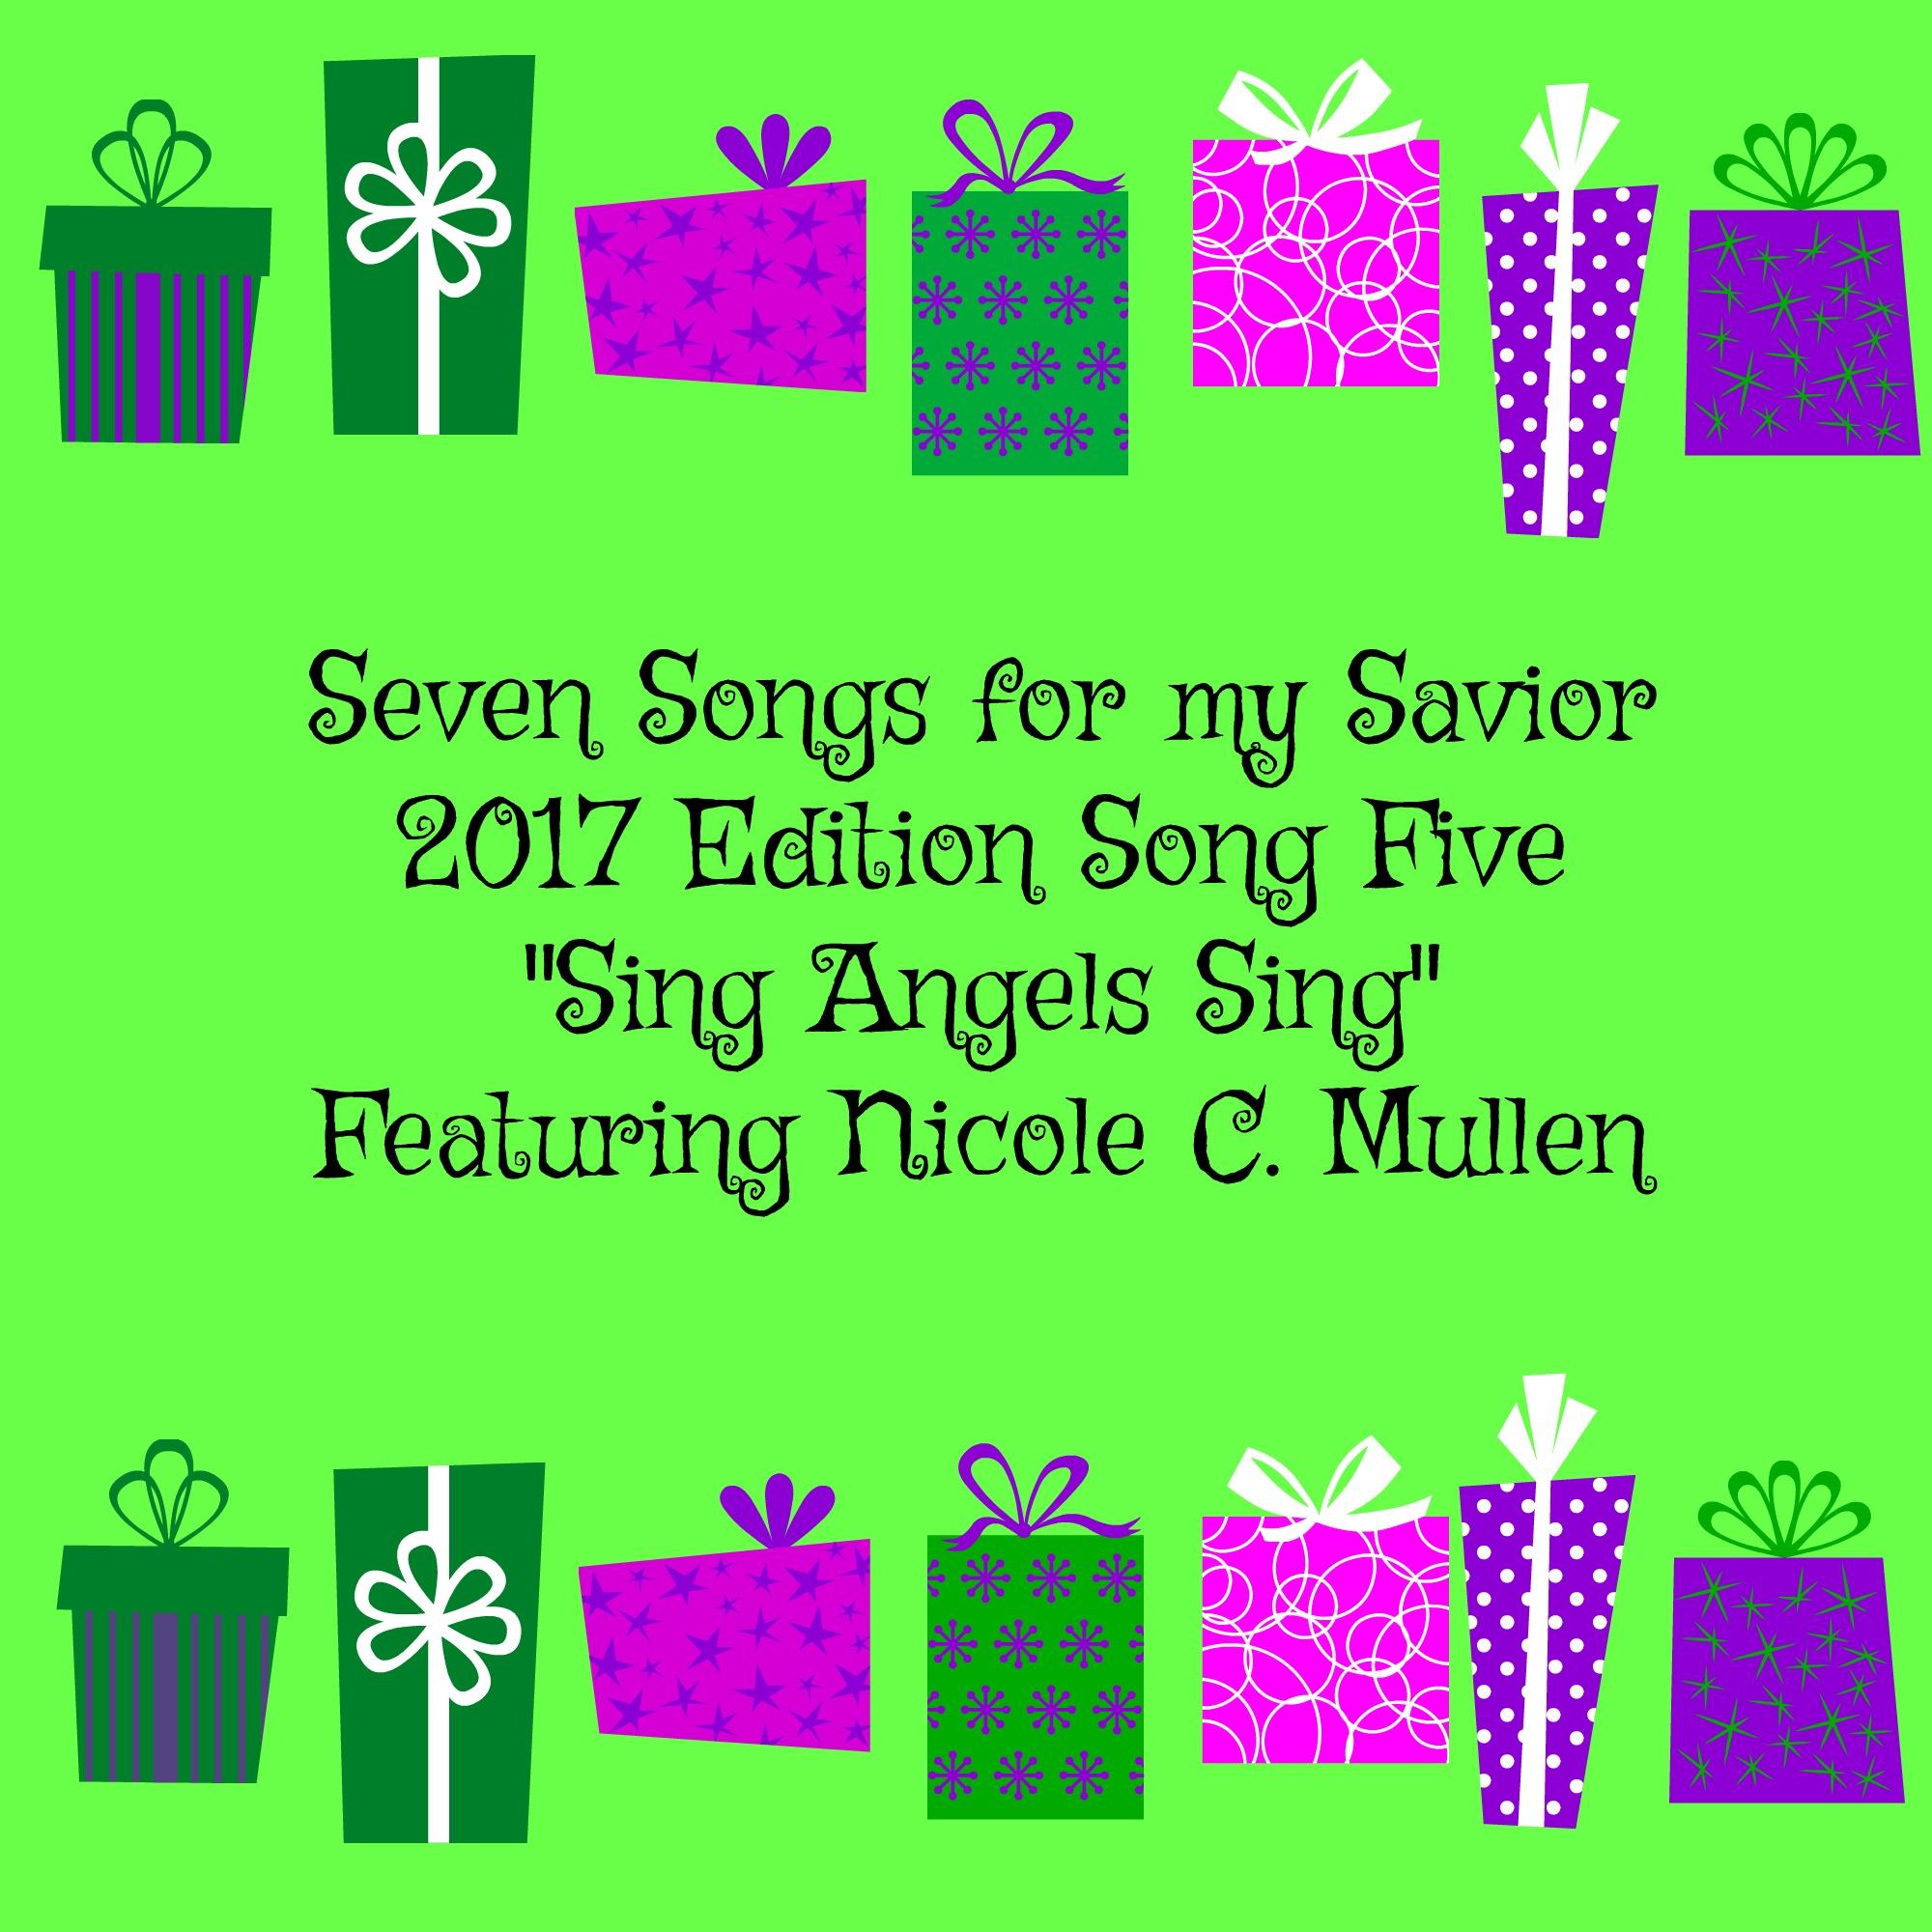 Sing Angels Sing